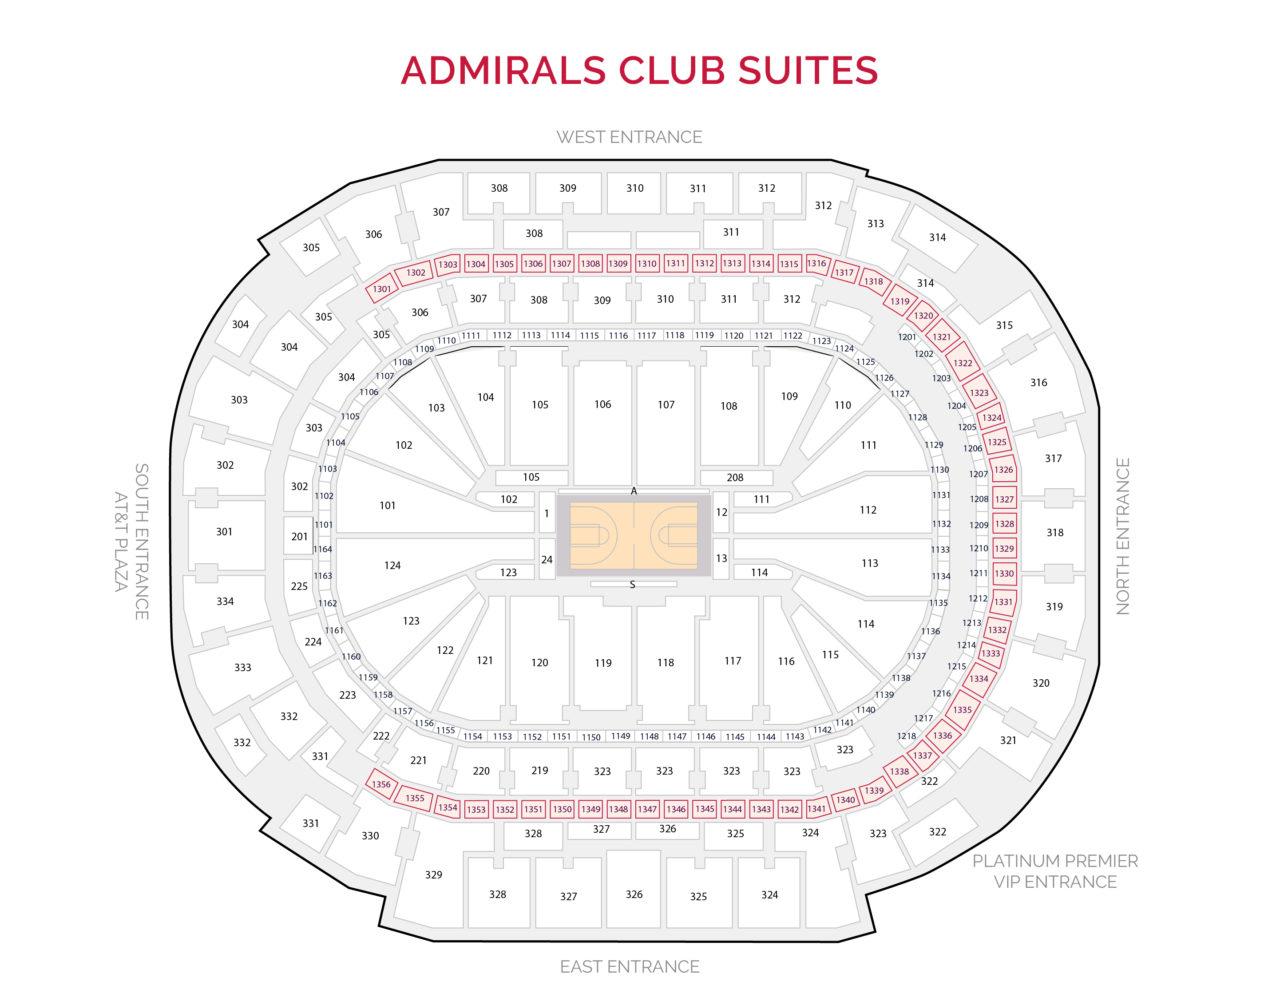 Dallas Mavericks Suites - Admirals Club